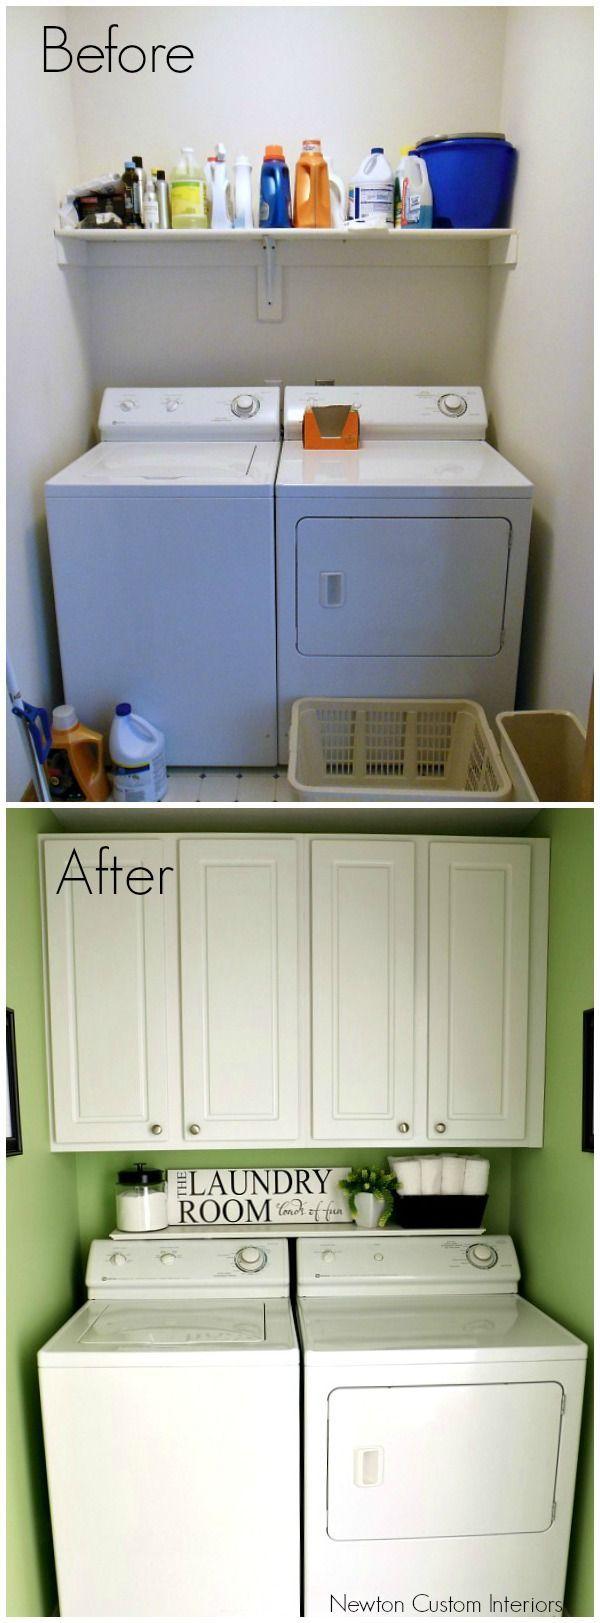 Laundry Room Reveal! - Newton Custom Interiors